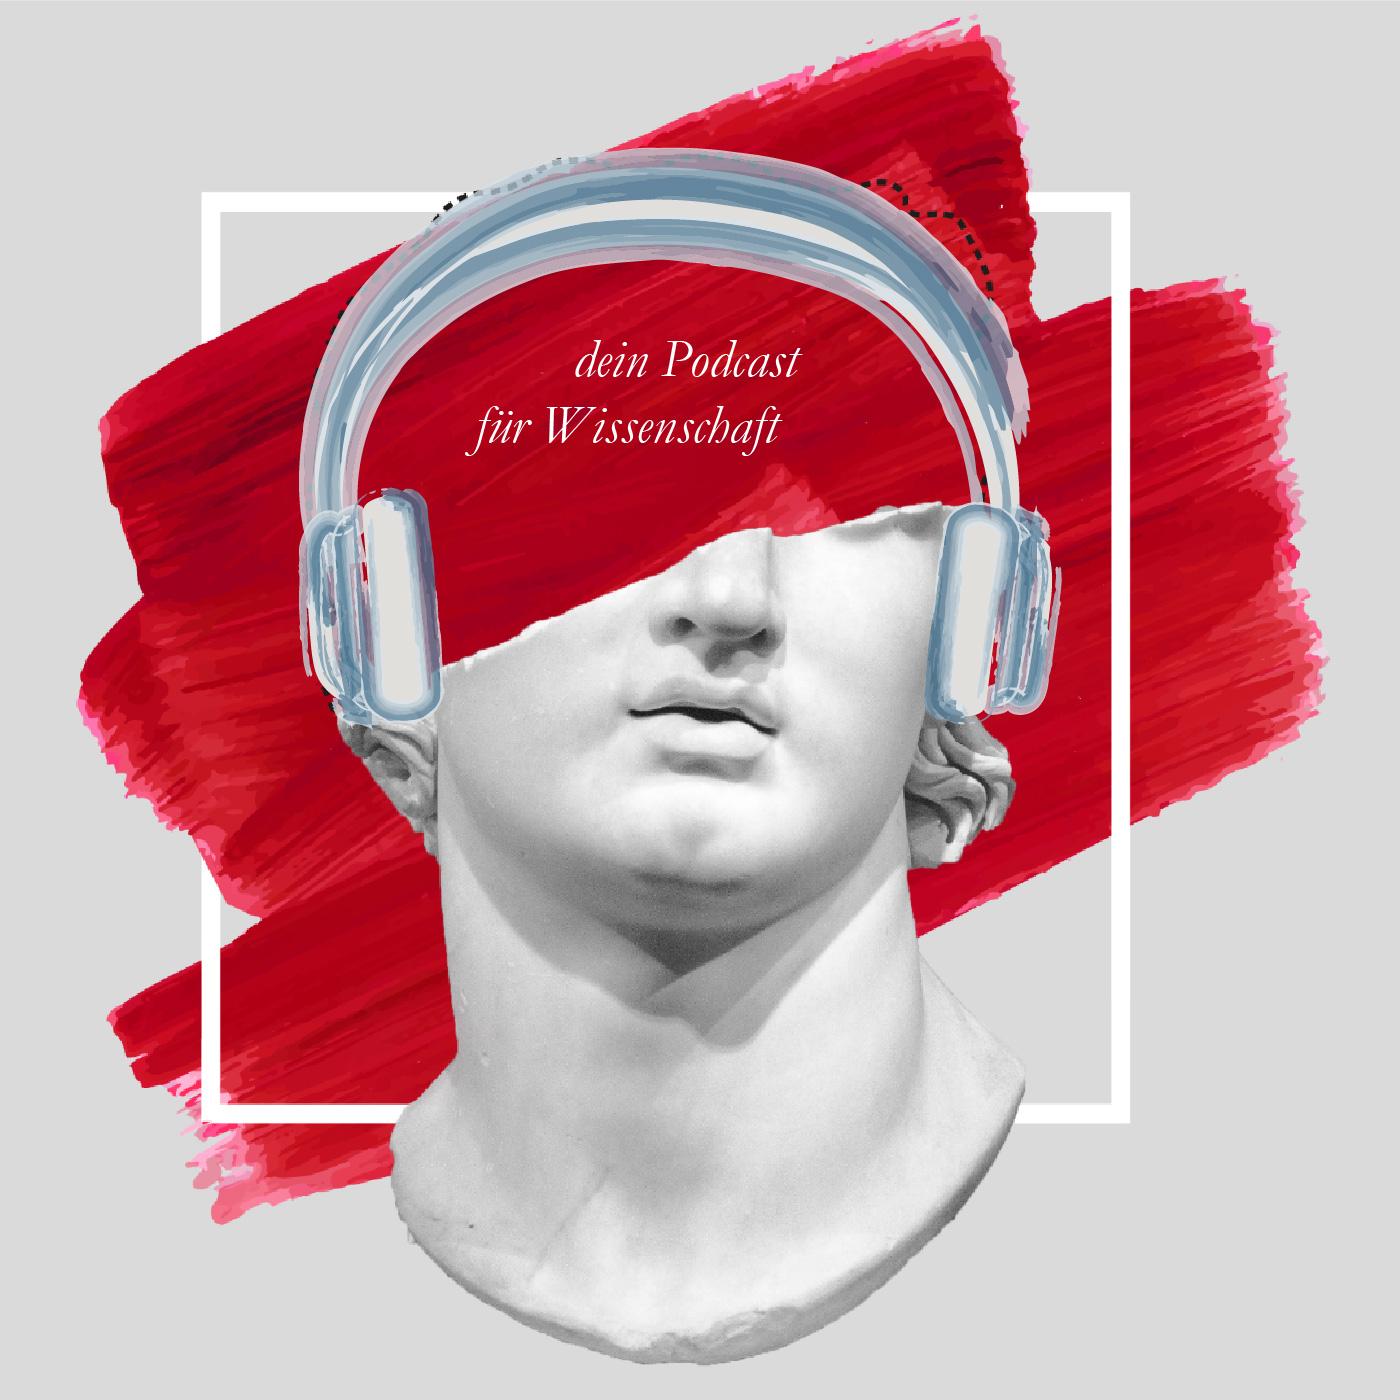 Florian Aigner Podcast alexandria